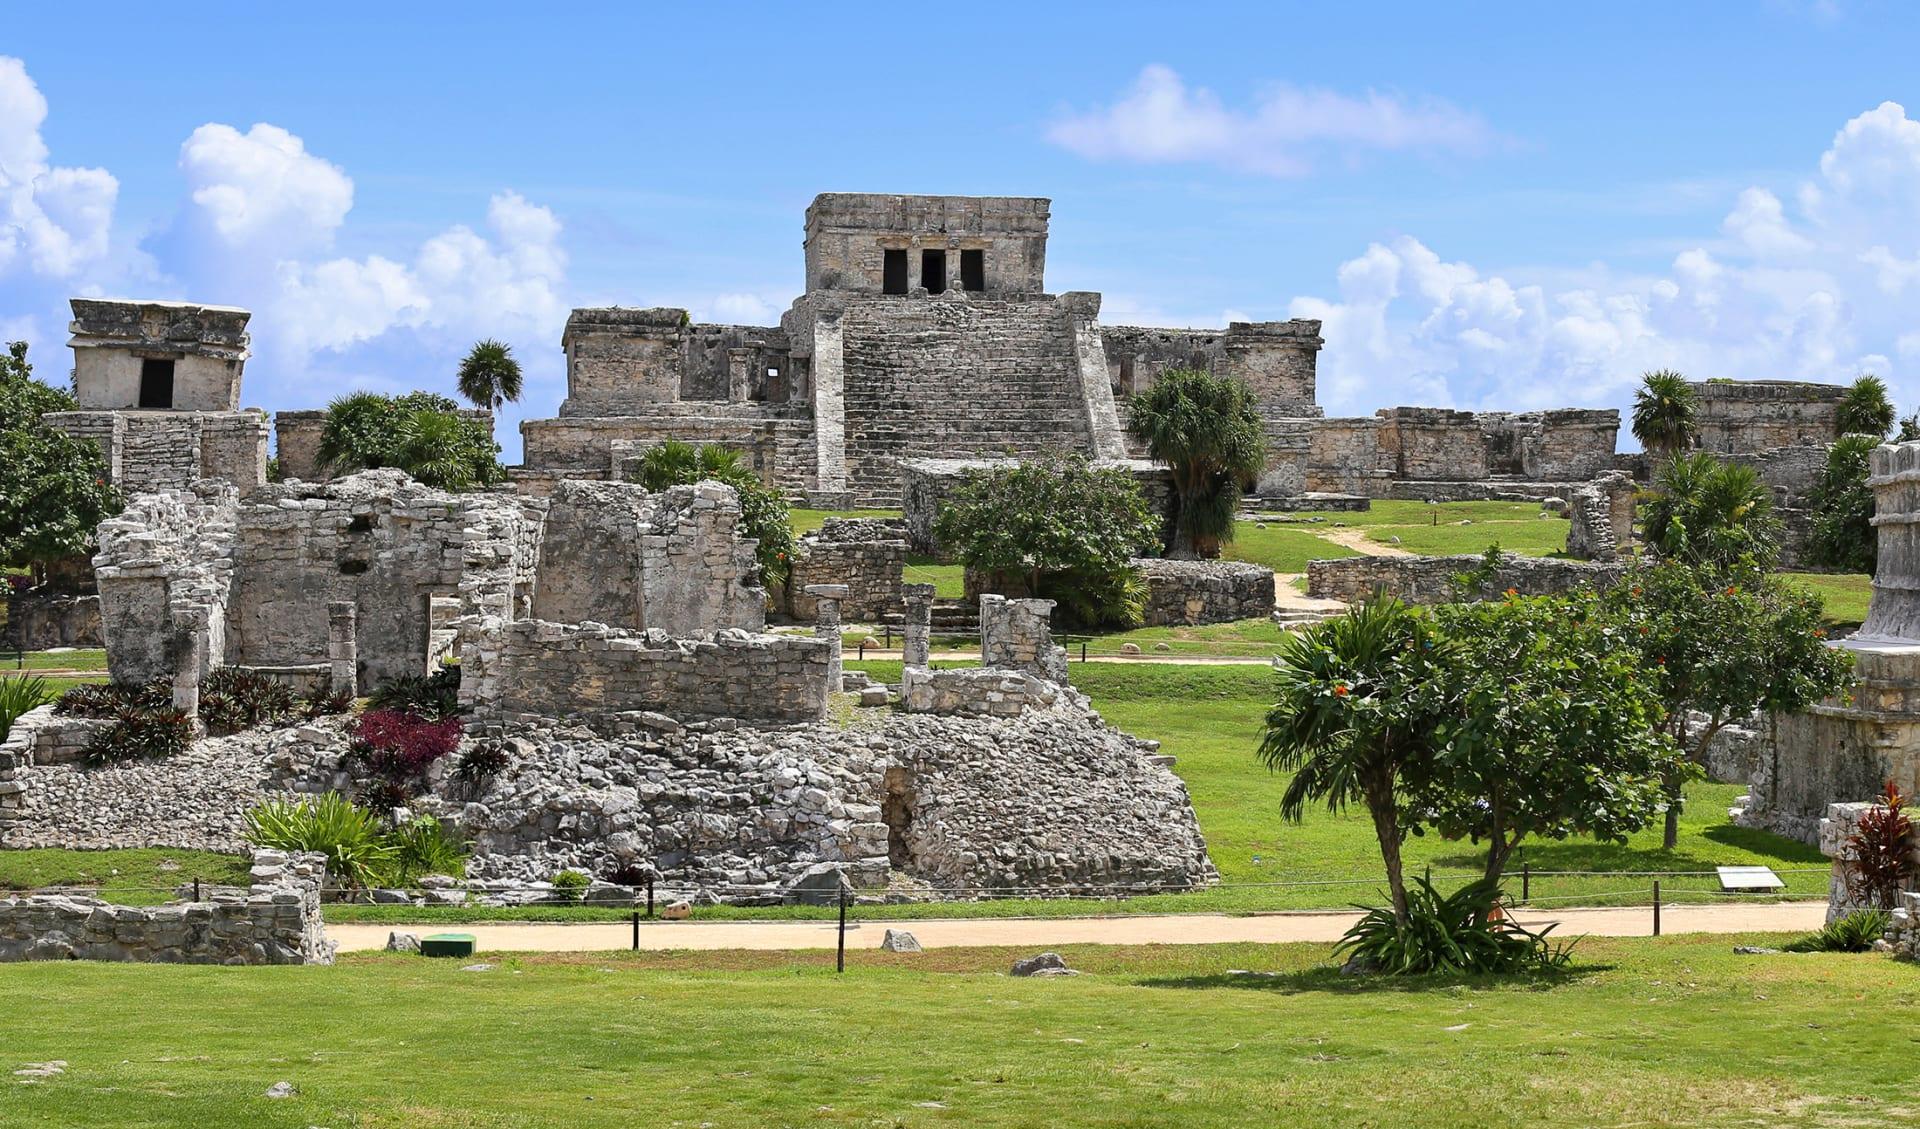 Maya Ruinen, Mexico